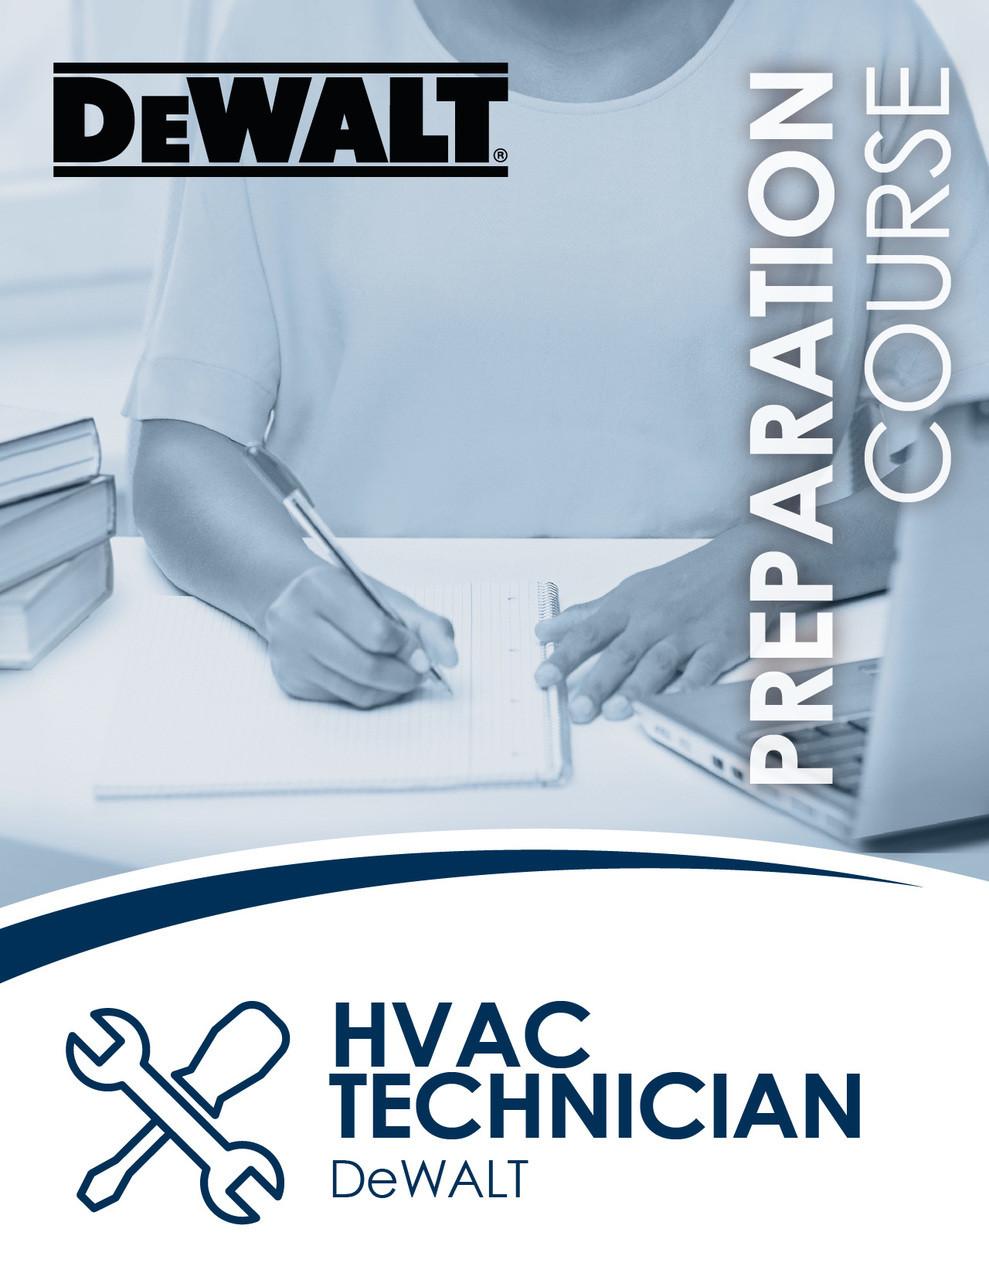 DeWalt HVAC Technician Certification Preparation - PSI